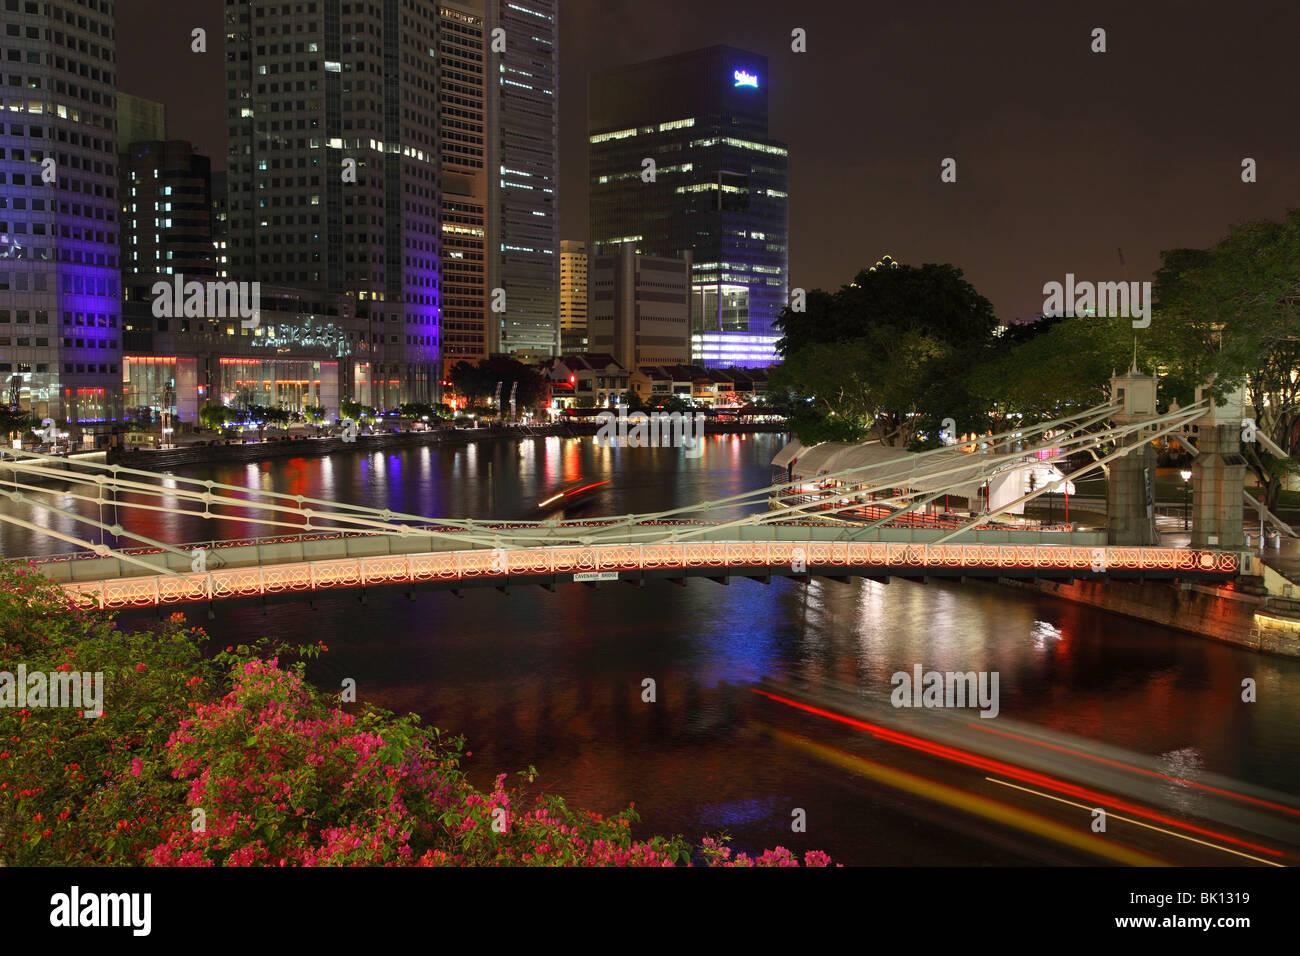 Cavenagh Bridge and Boat Quay at night. - Stock Image